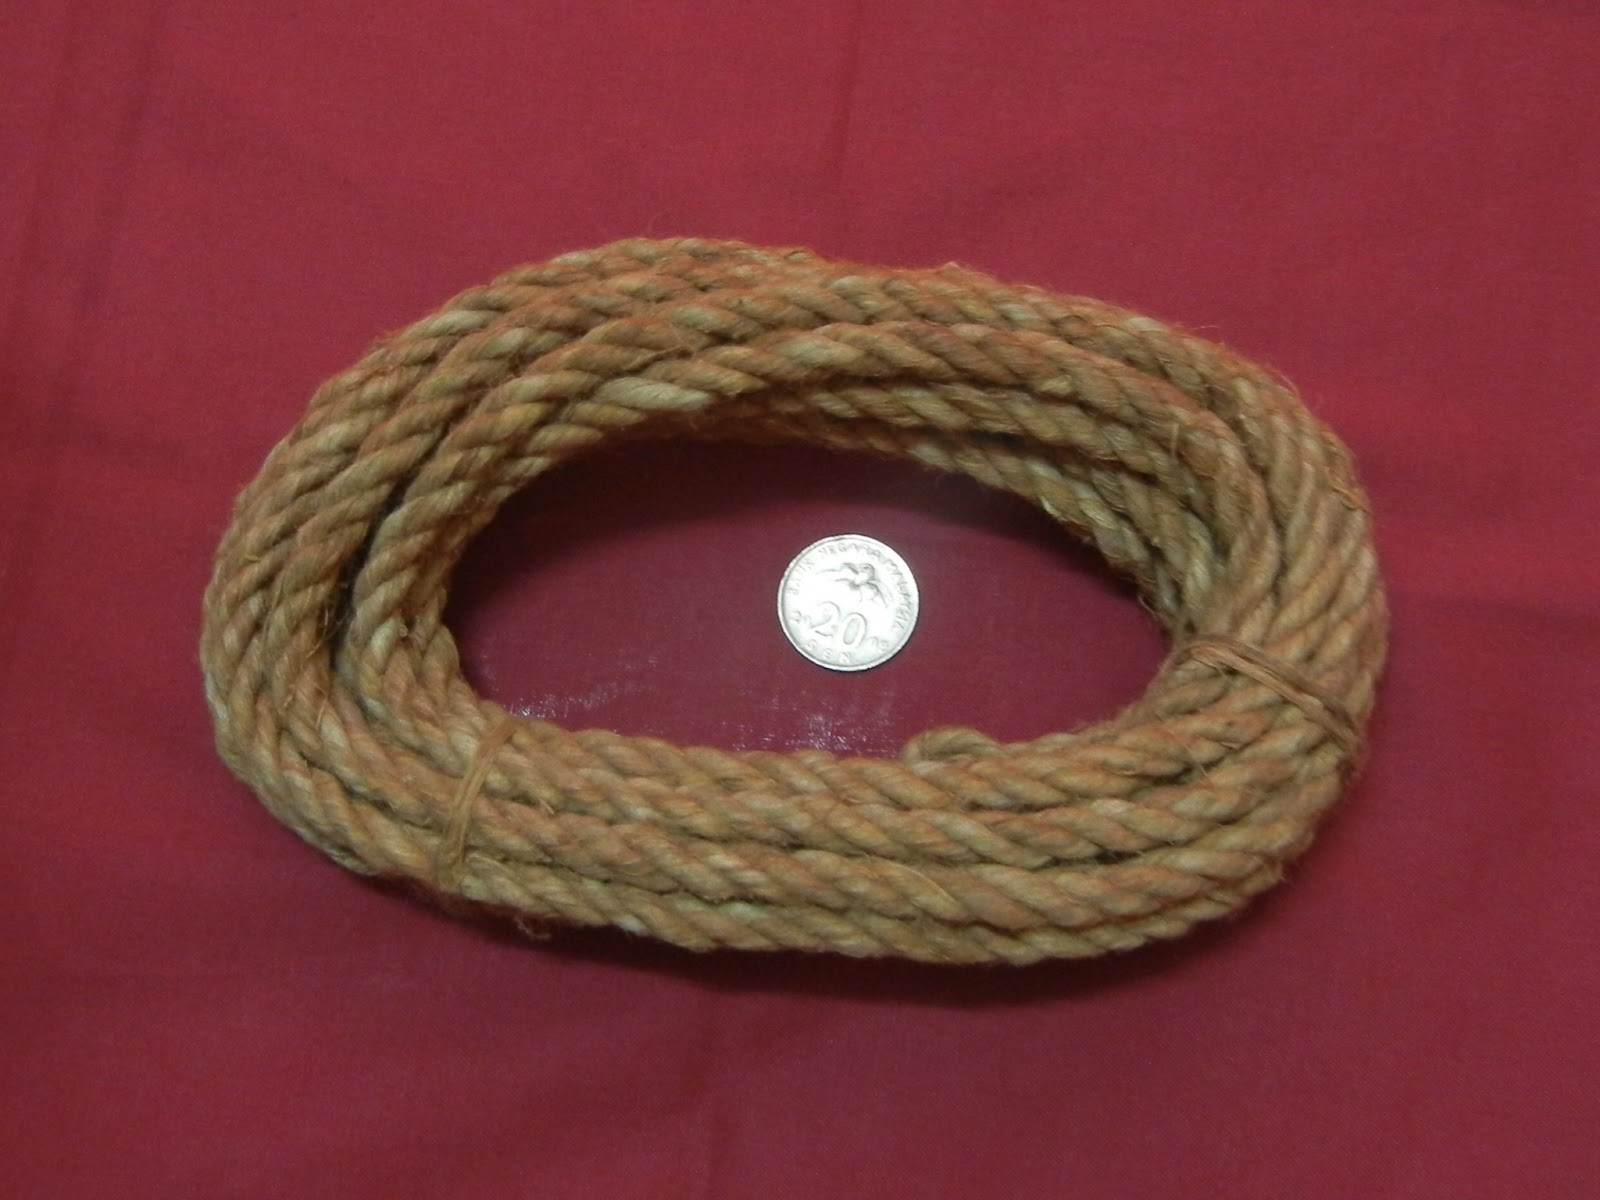 geliga kinabalu tali kulit kayu asli